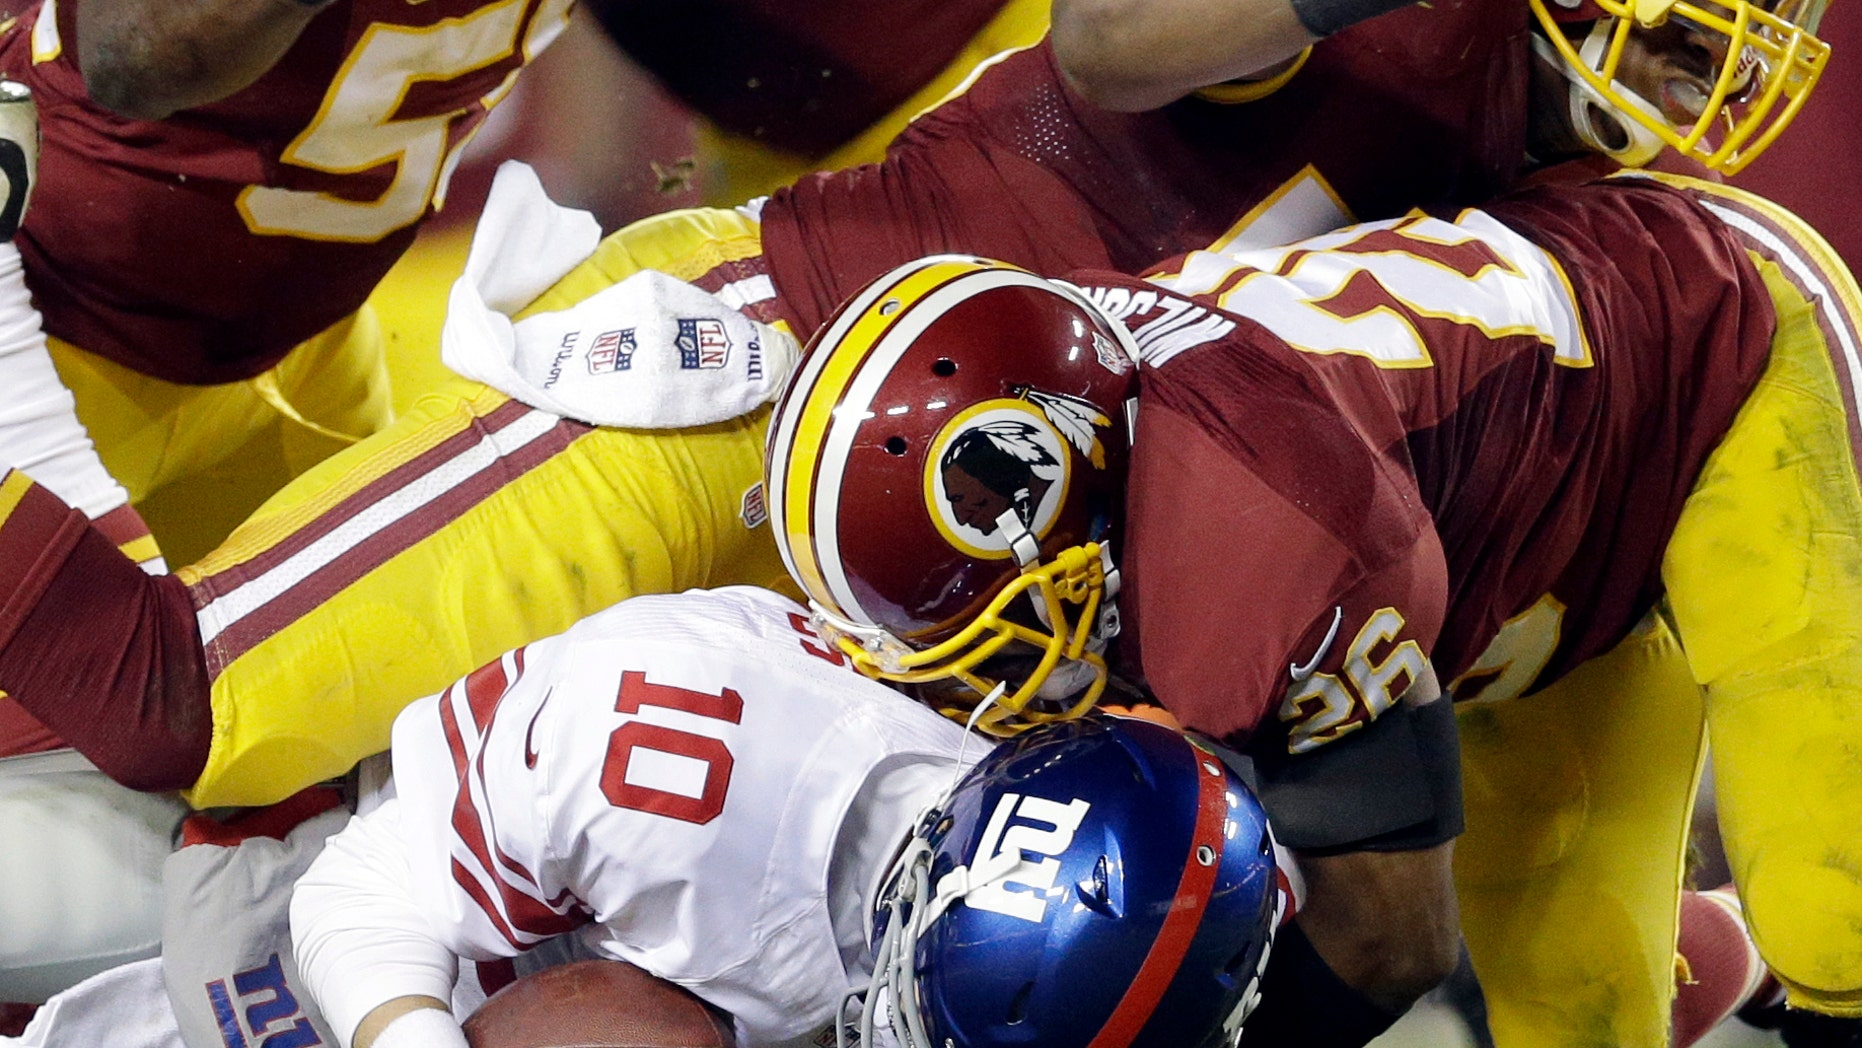 New York Giants quarterback Eli Manning (10) is sacked by Washington Redskins inside linebacker London Fletcher (59), outside linebacker Rob Jackson (50)  and cornerback Josh Wilson during the second half of an NFL football game Sunday, Dec. 1, 2013, in Landover, Md. The Giants won 24-17. (AP Photo/Patrick Semansky)